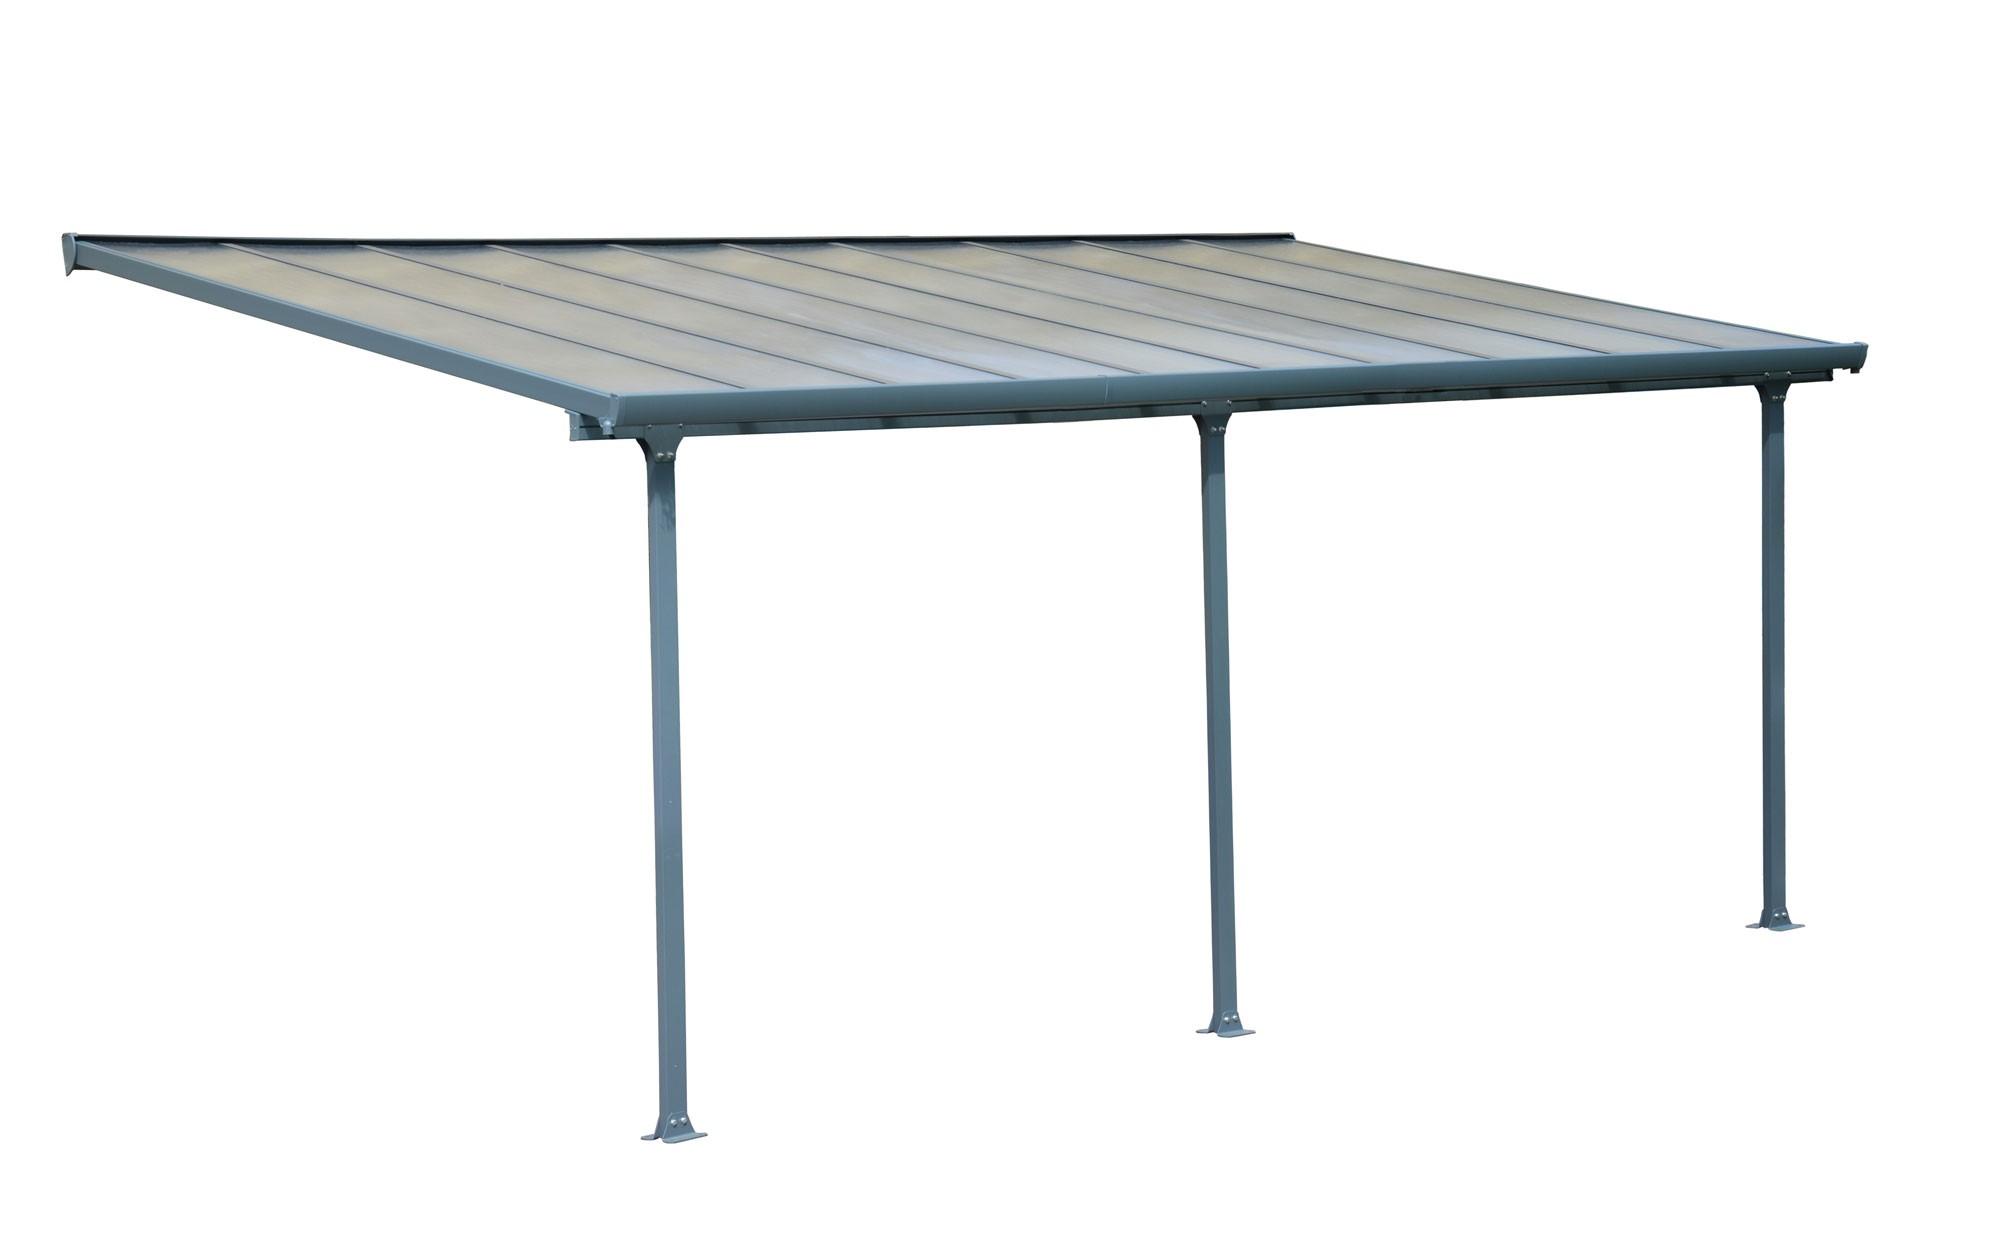 terrassen berdachung carport alu grau. Black Bedroom Furniture Sets. Home Design Ideas